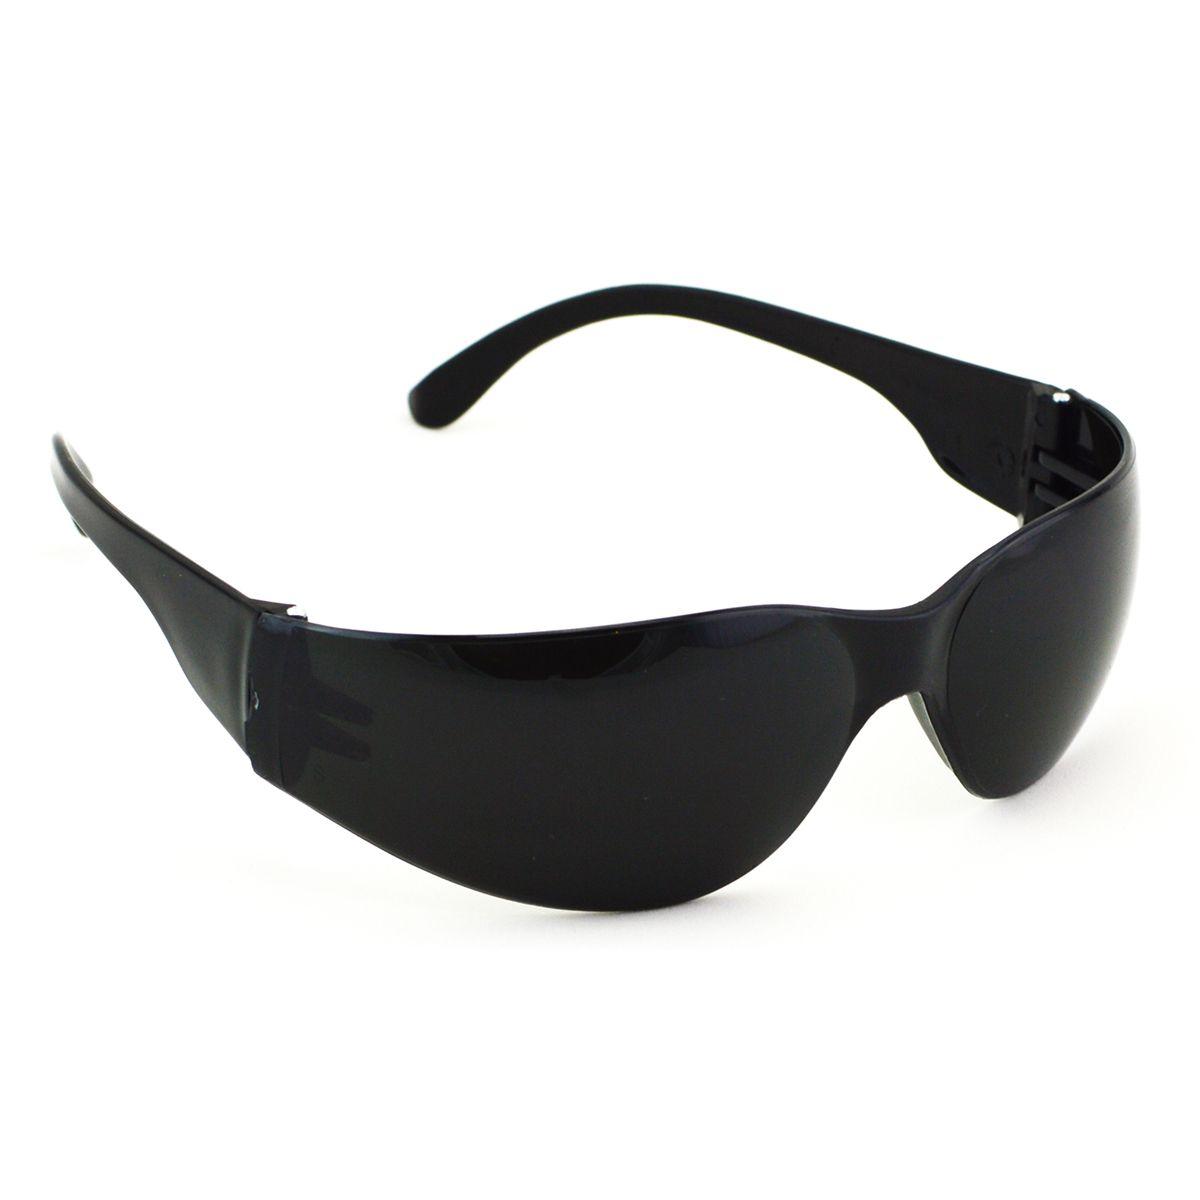 Óculos Valeplast Sport Fumê Similar Leopardo - 10 Unid.